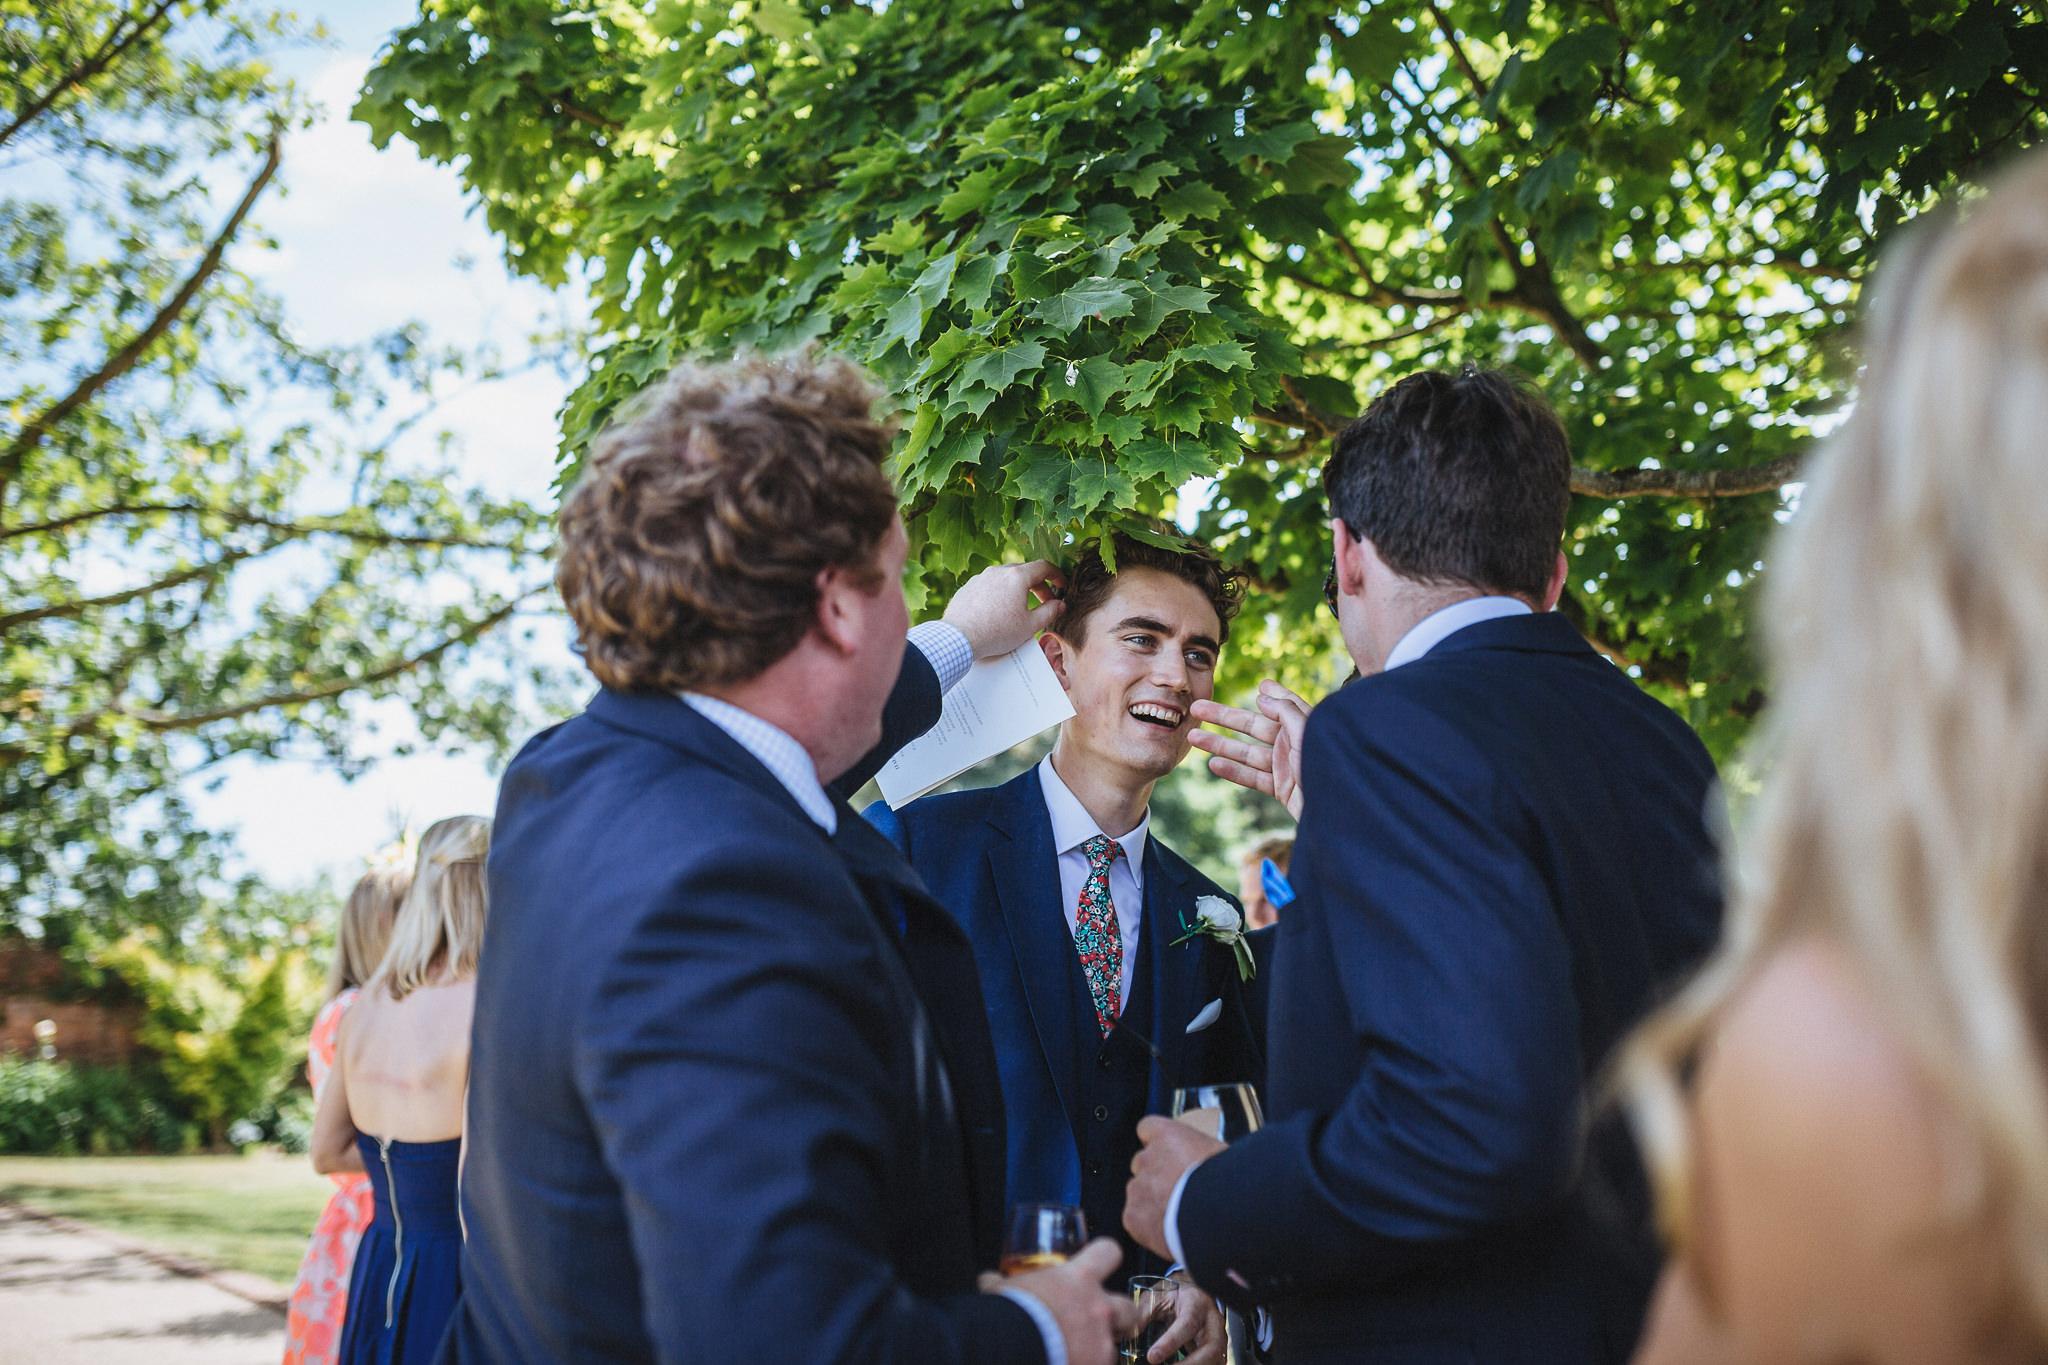 paul-marbrook-Gaynes-Park Wedding-Photographer-90068